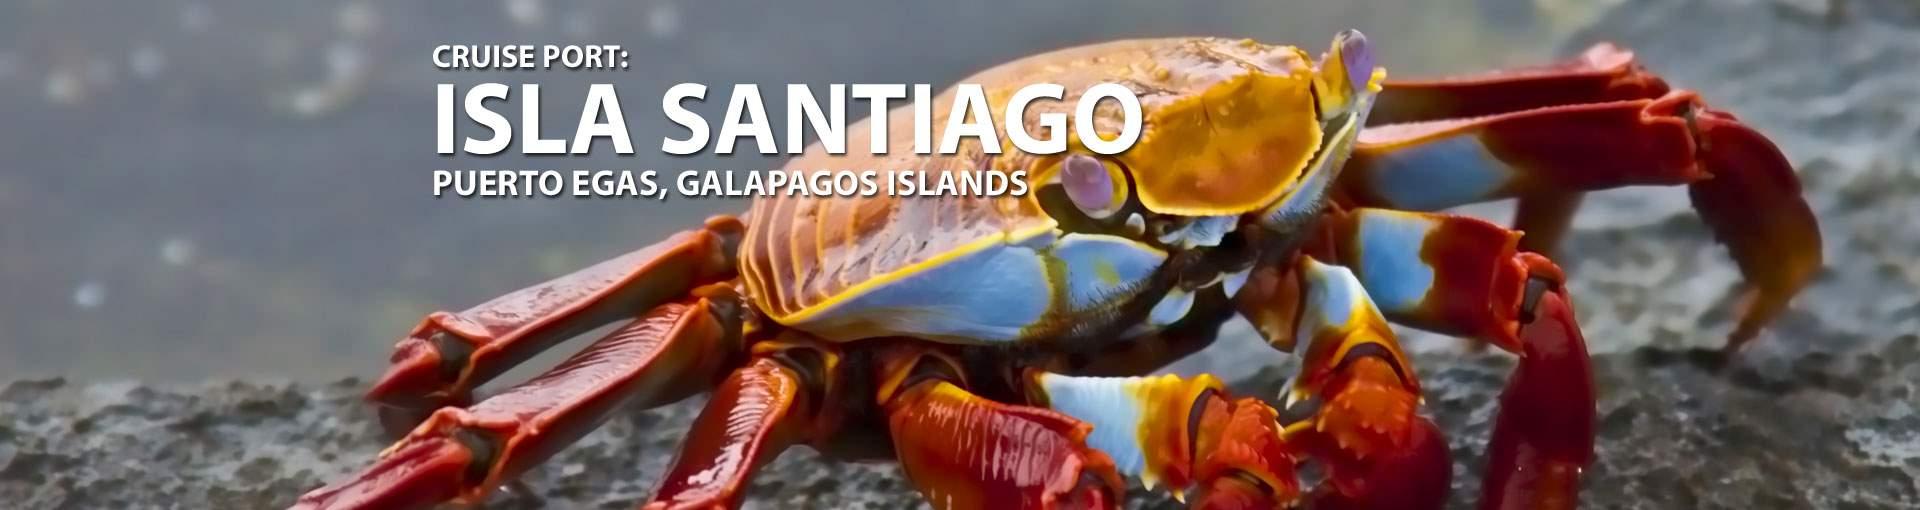 Cruises to Isla Santiago, Galapagos Islands